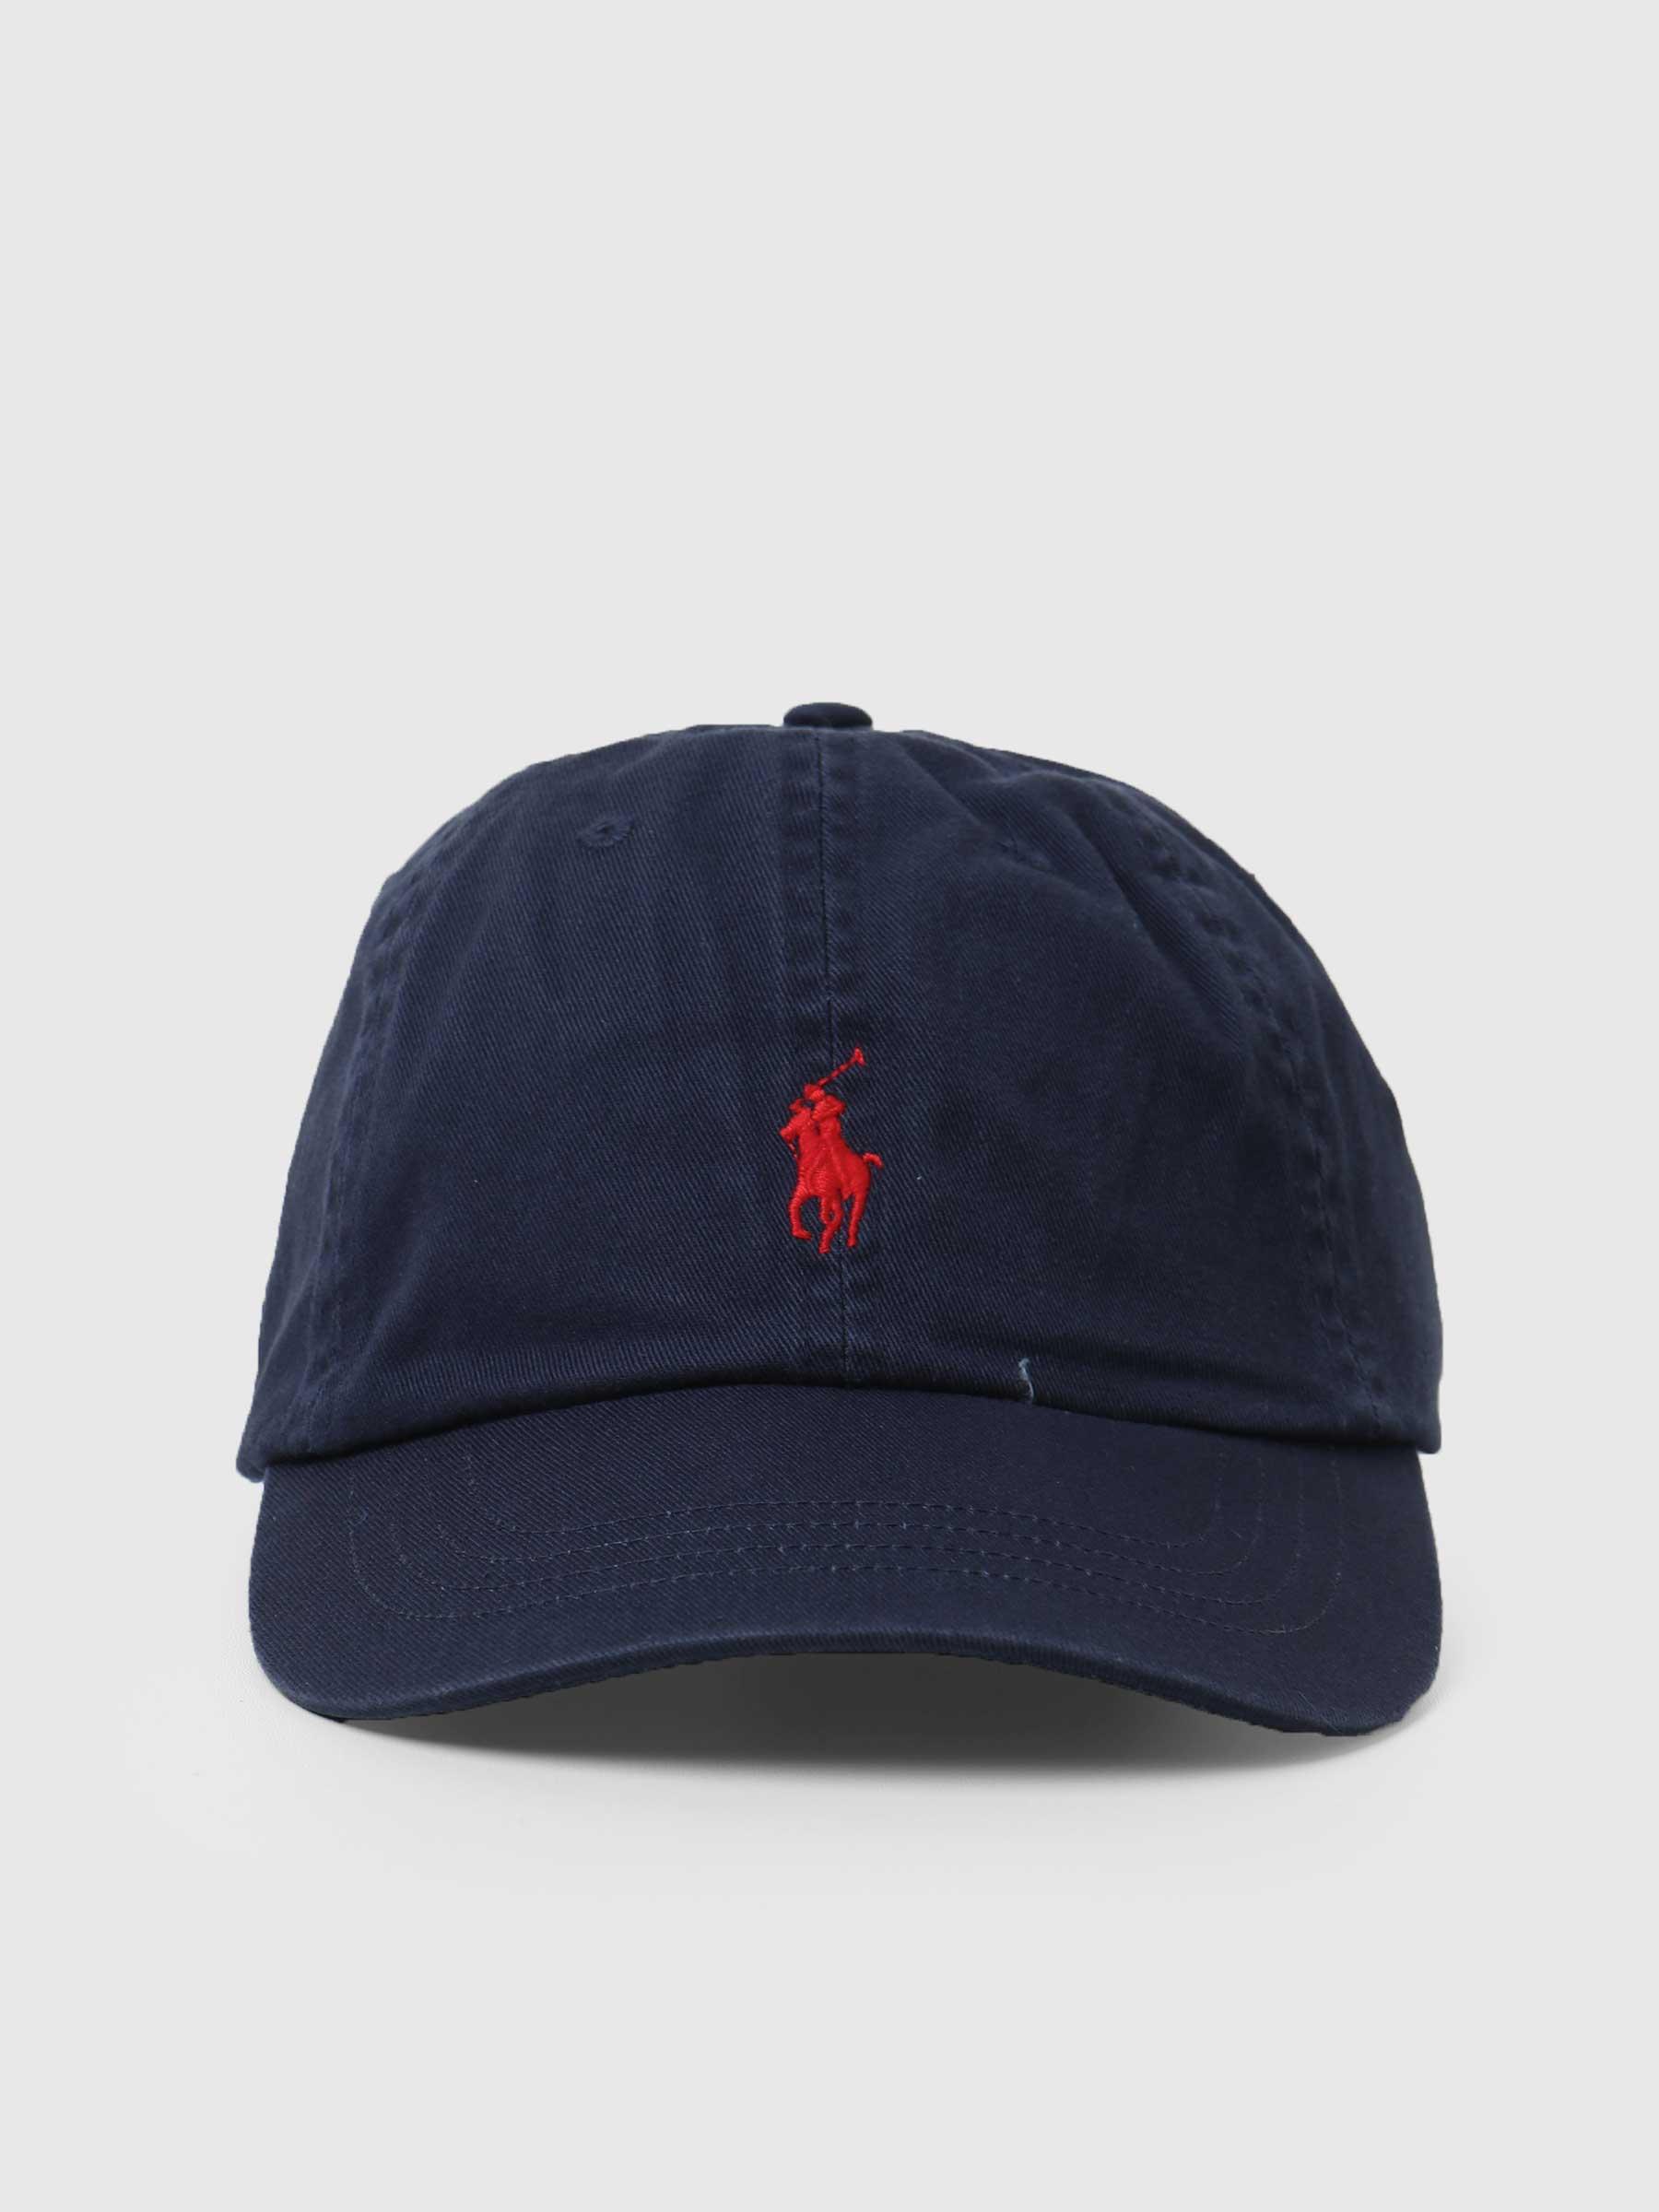 Classic Sport Cap Newport Navy Red 710548524007